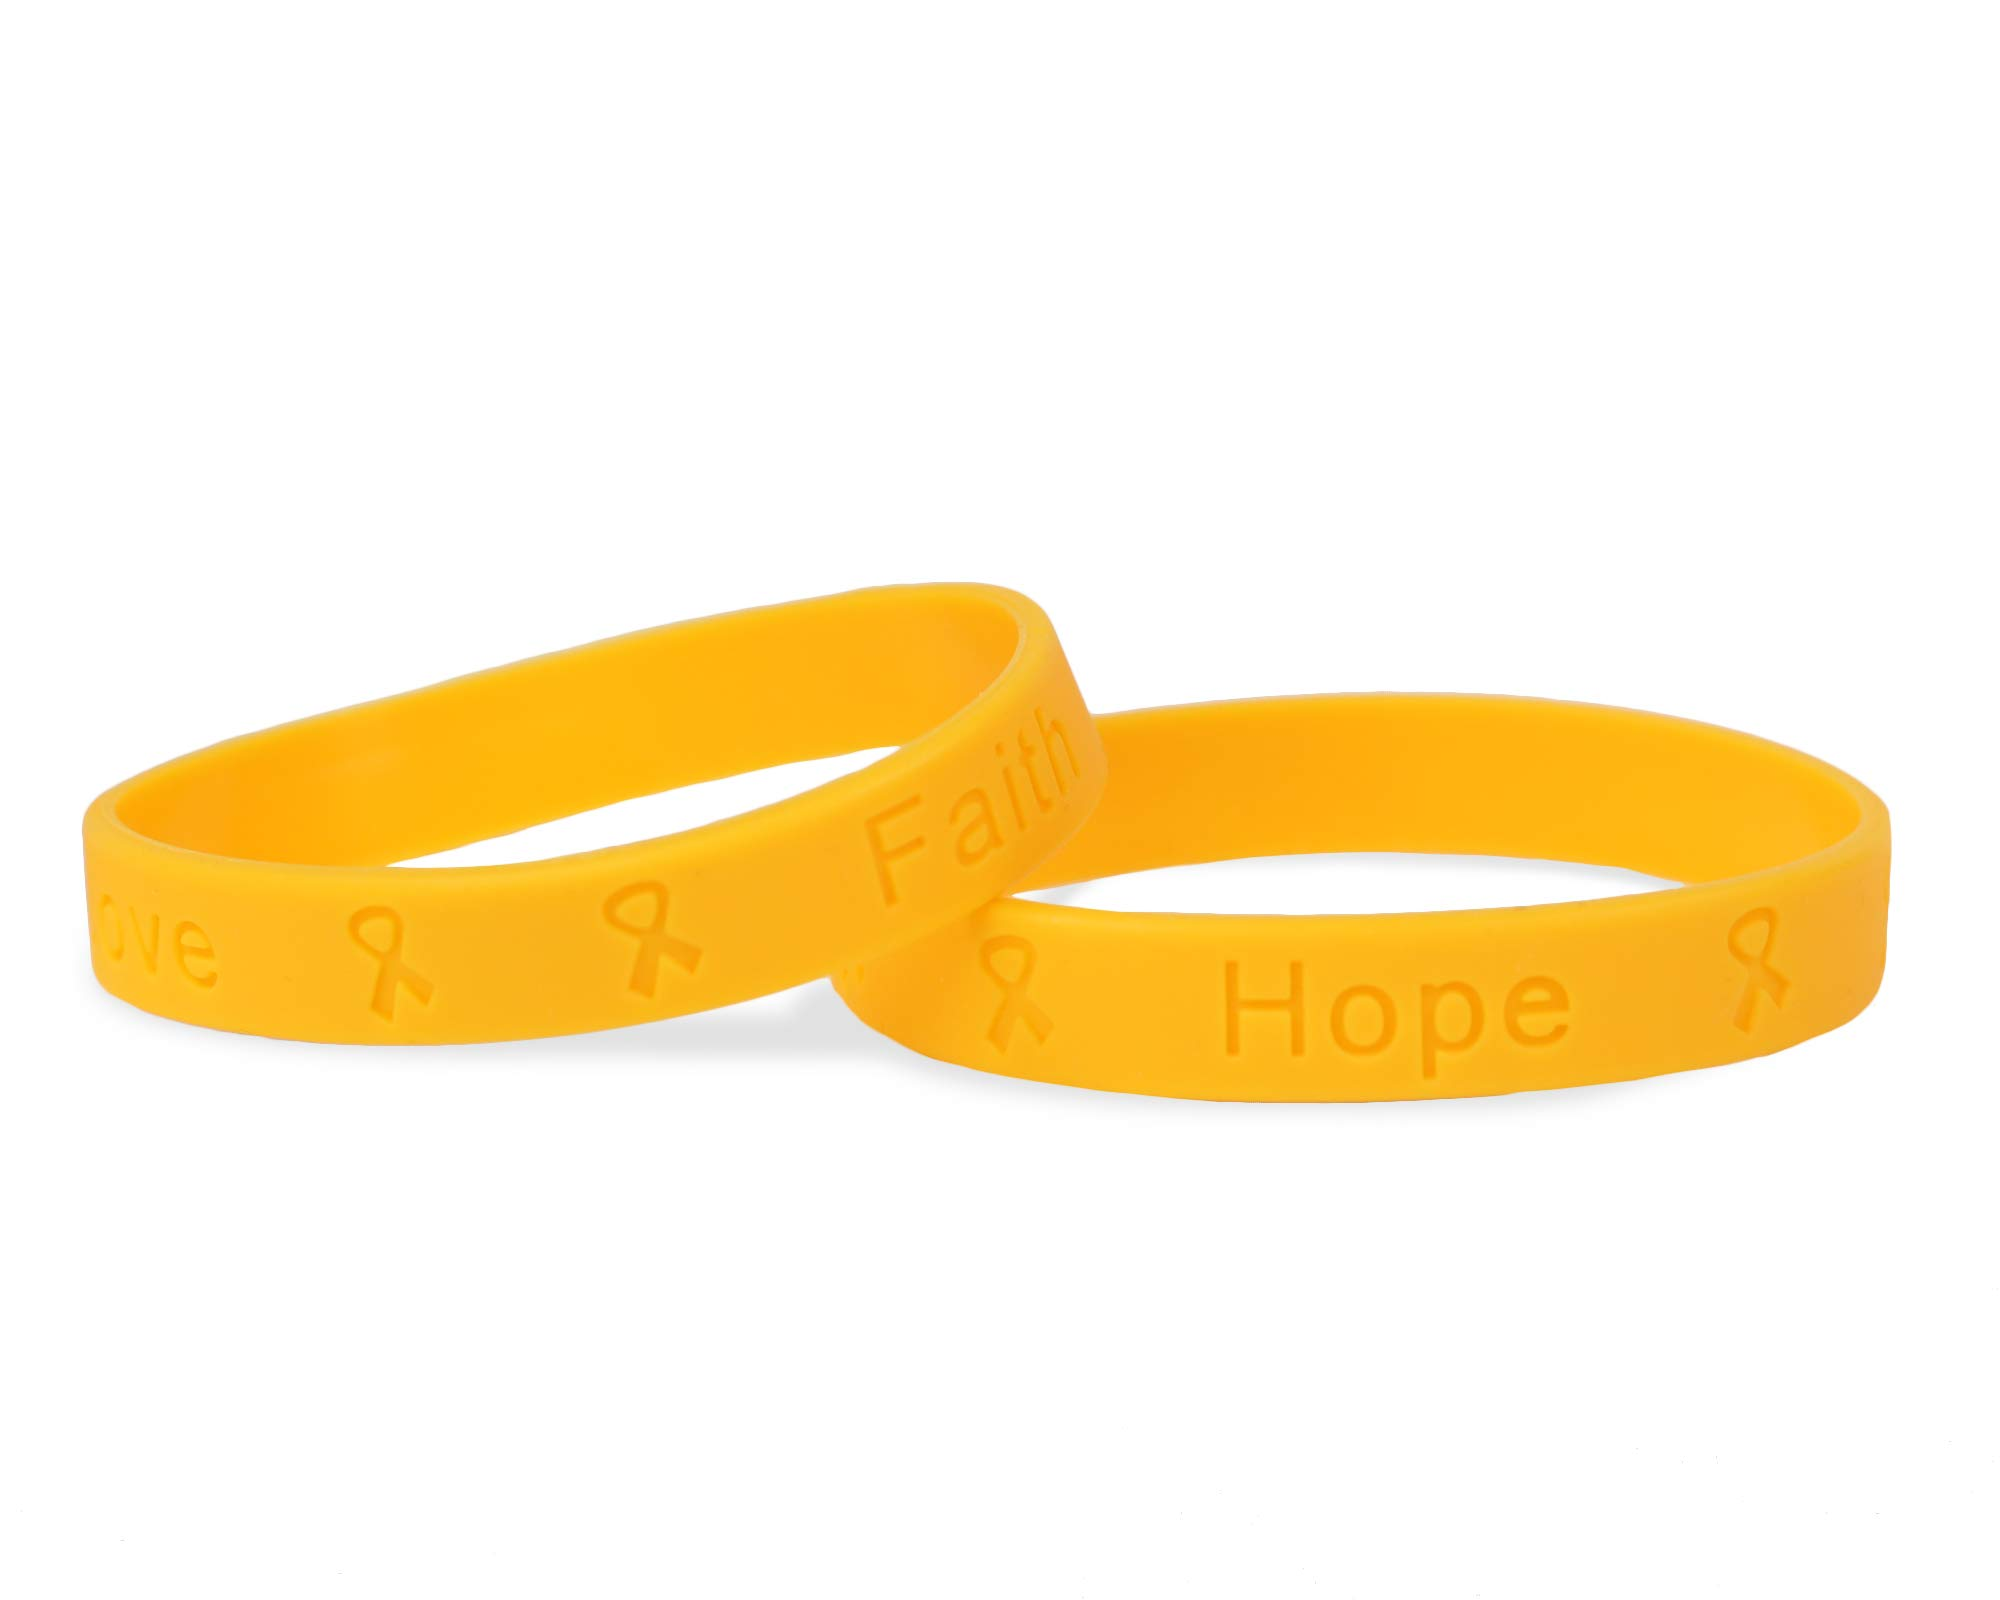 25 Pack Child Gold Silicone Bracelets - Child Size (Wholesale Pack - 25 Bracelets)